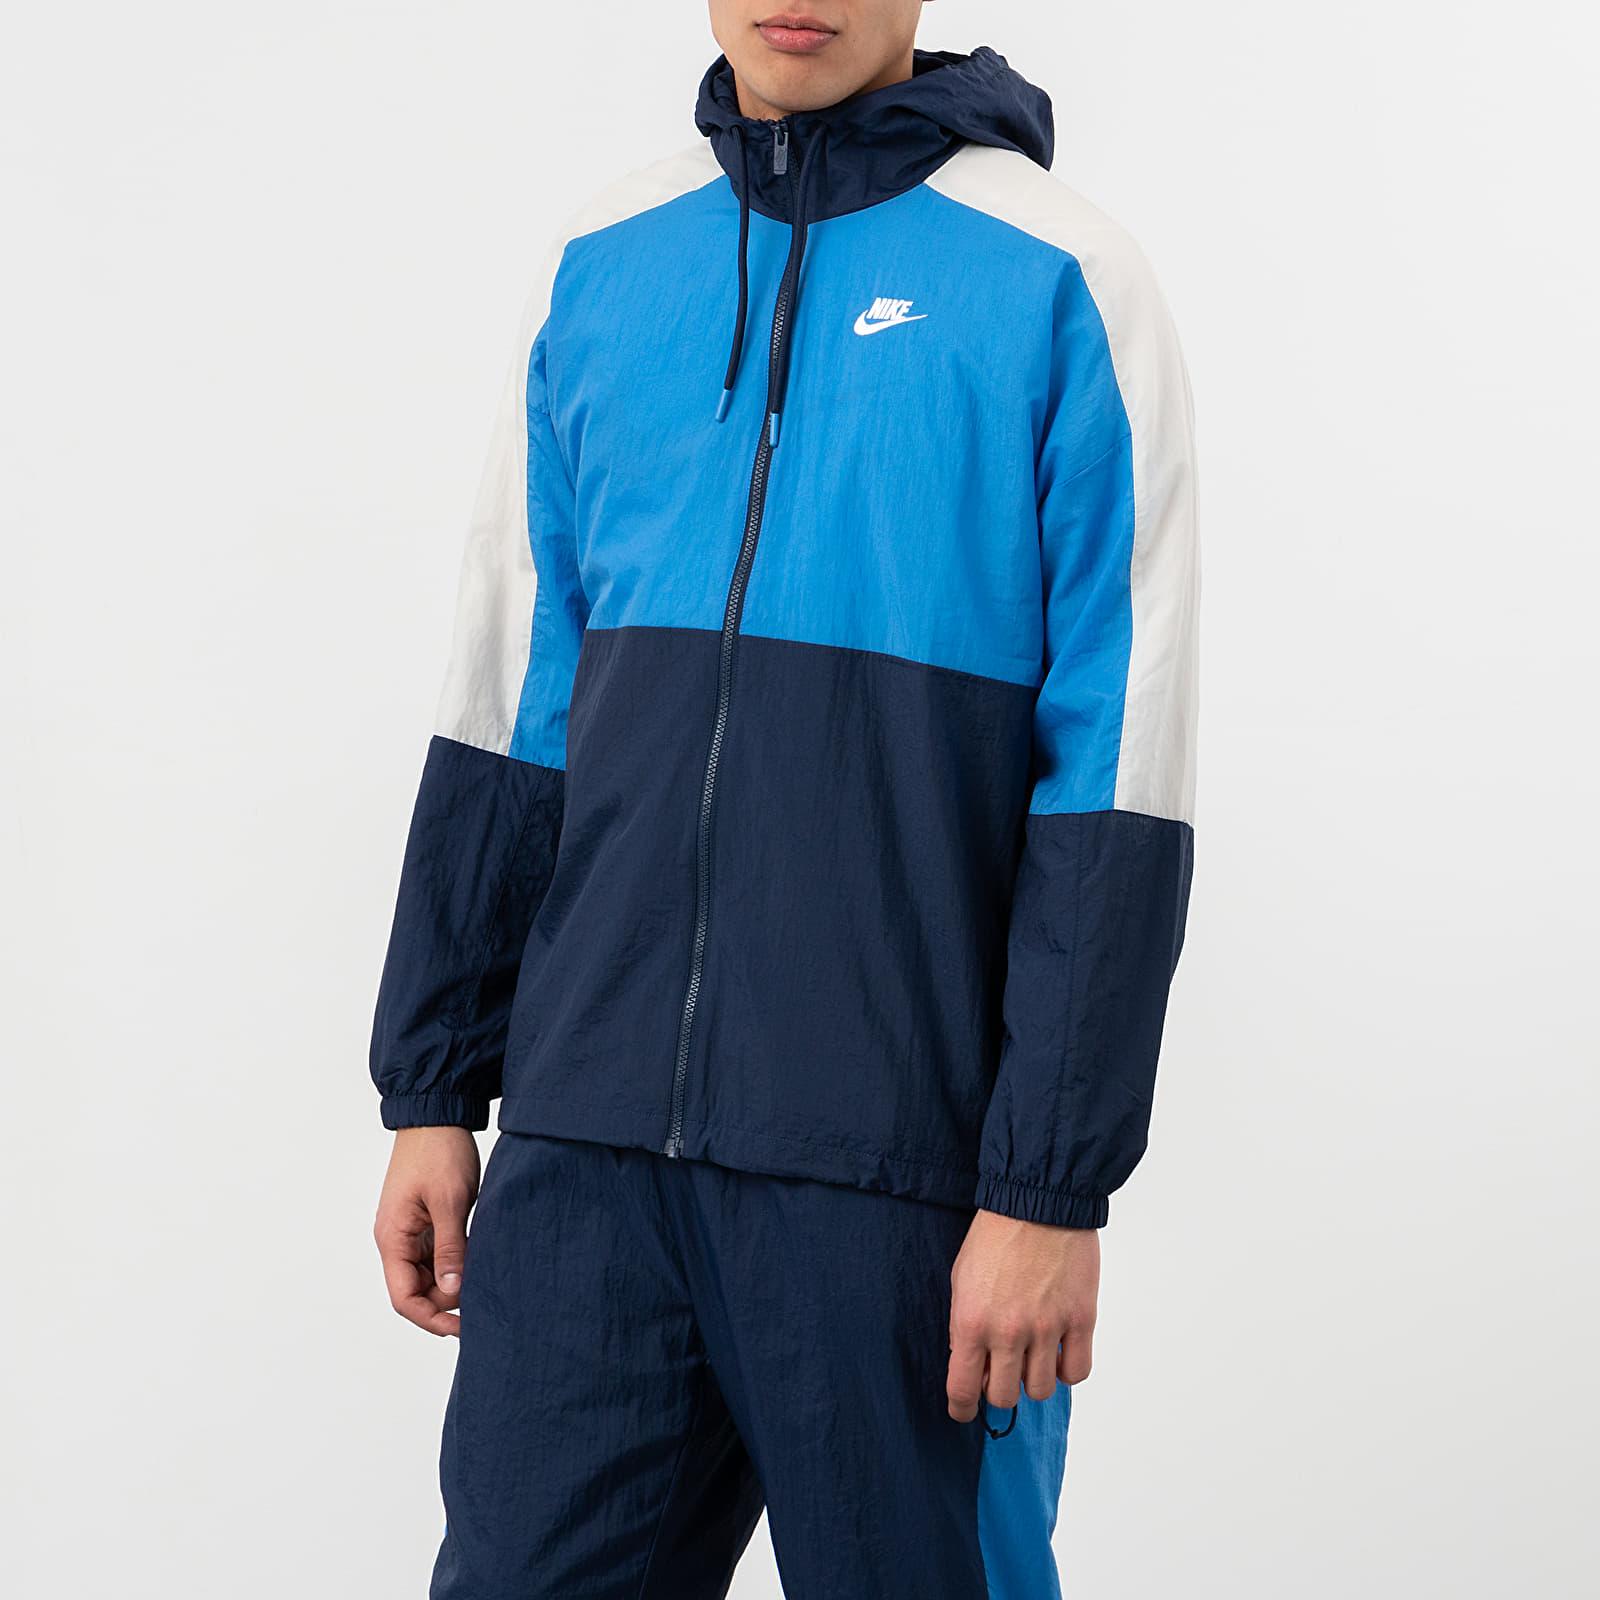 Dzsekik Nike Sportswear Hooded Woven CB Jacket Midnight Navy/ Pacific Blue/ White